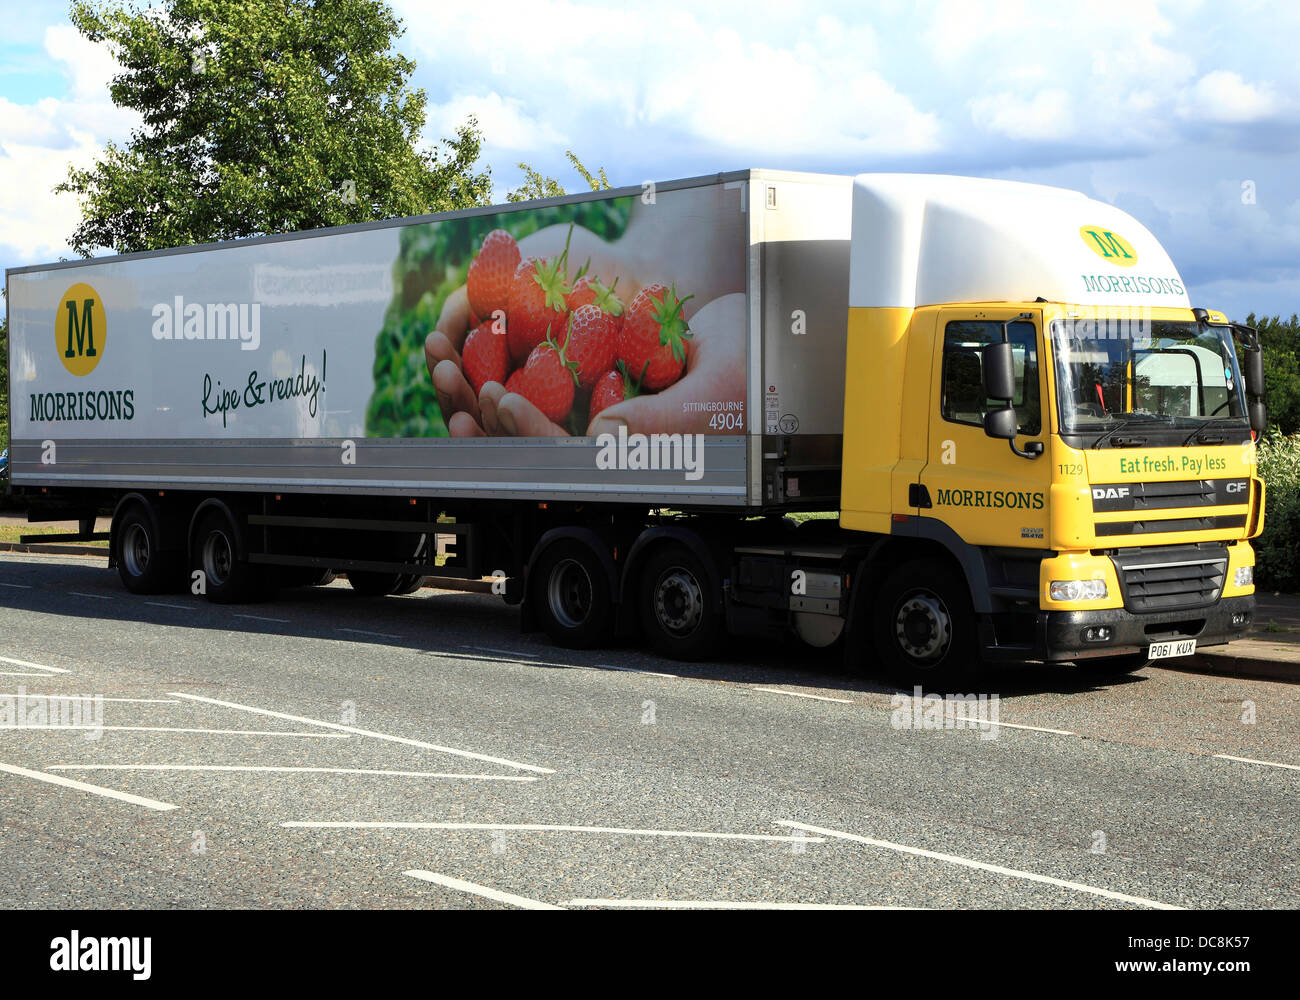 Morrisons Supermarket transit delivery truck lorry vehicle English supermarkets vehicles trucks England UK - Stock Image